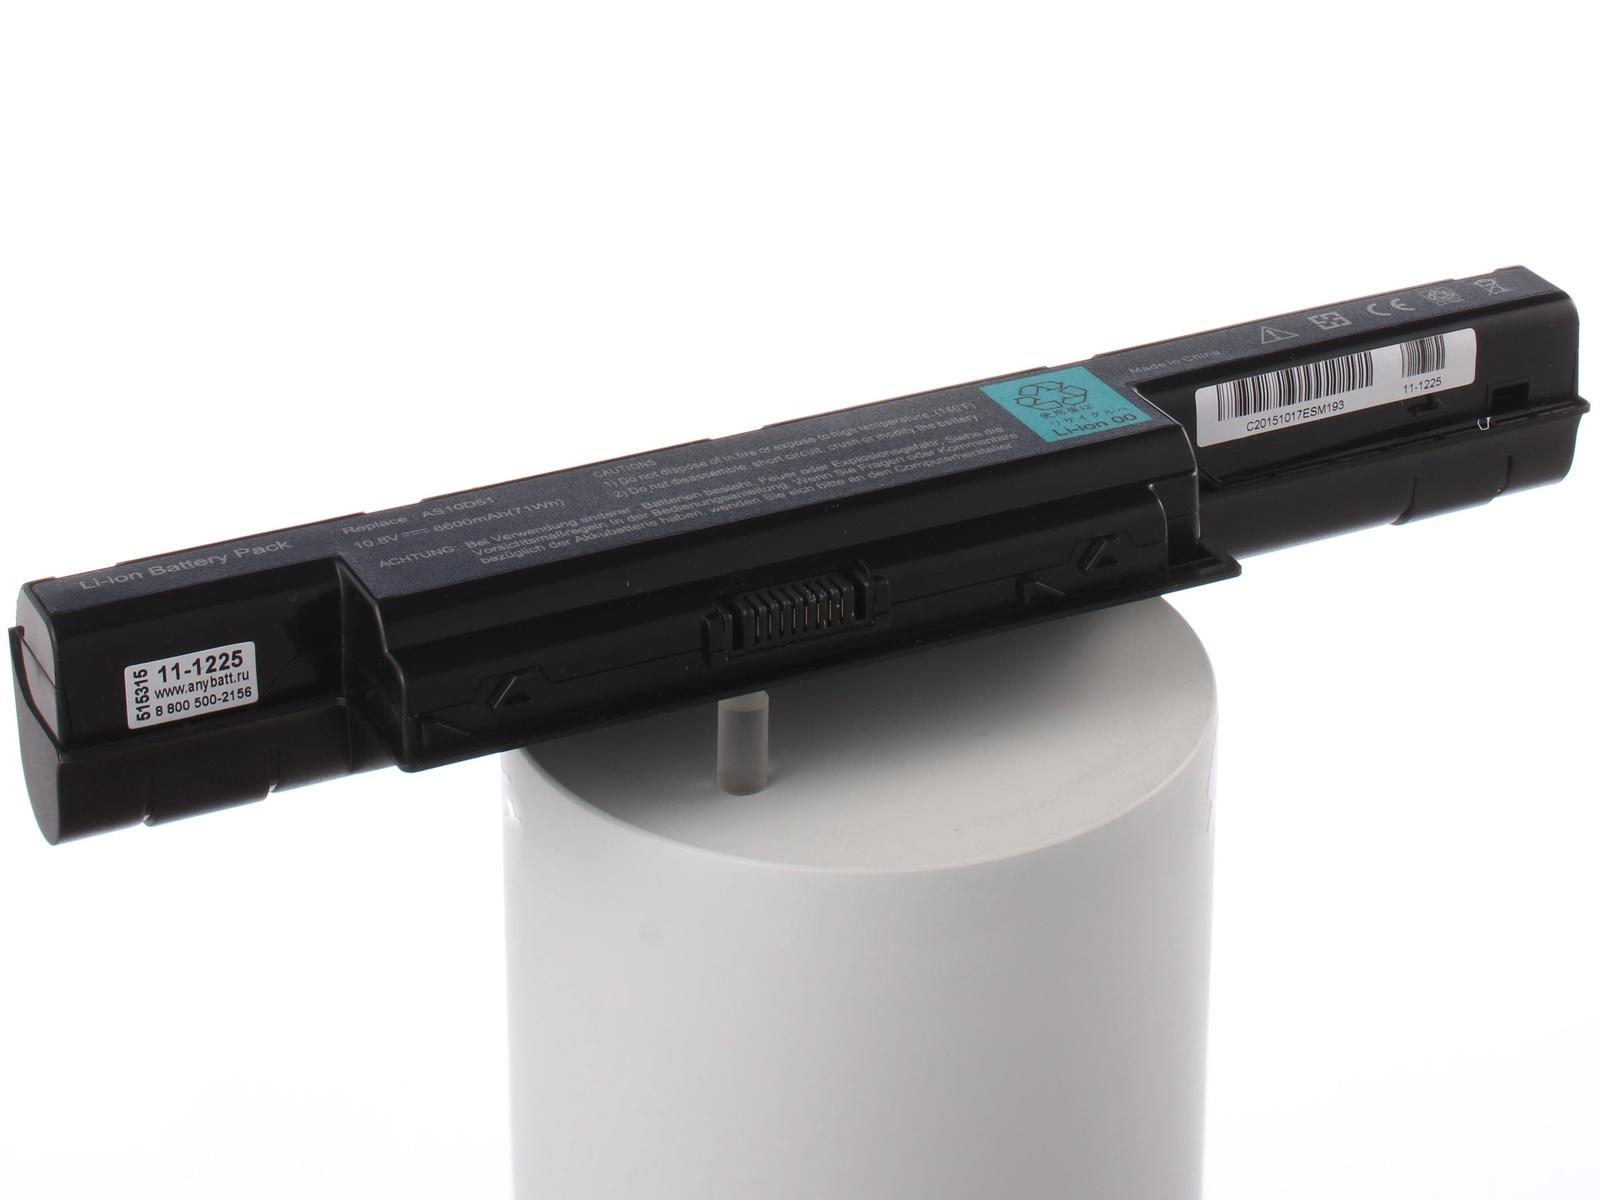 Аккумулятор для ноутбука AnyBatt для Acer eMachines E732-382G32Mikk, eMachines E732G-332G25Mikk, eMachines G730ZG-P622G32Miks, TravelMate 5735, TravelMate 5742ZG, TravelMate 8472T, TravelMate P273-M, Aspire 4738Z аккумулятор для ноутбука anybatt для acer emachines e732 382g32mikk emachines e732g 332g25mikk emachines g730zg p622g32miks travelmate 5735 travelmate 5742zg travelmate 8472t travelmate p273 m aspire 4738z